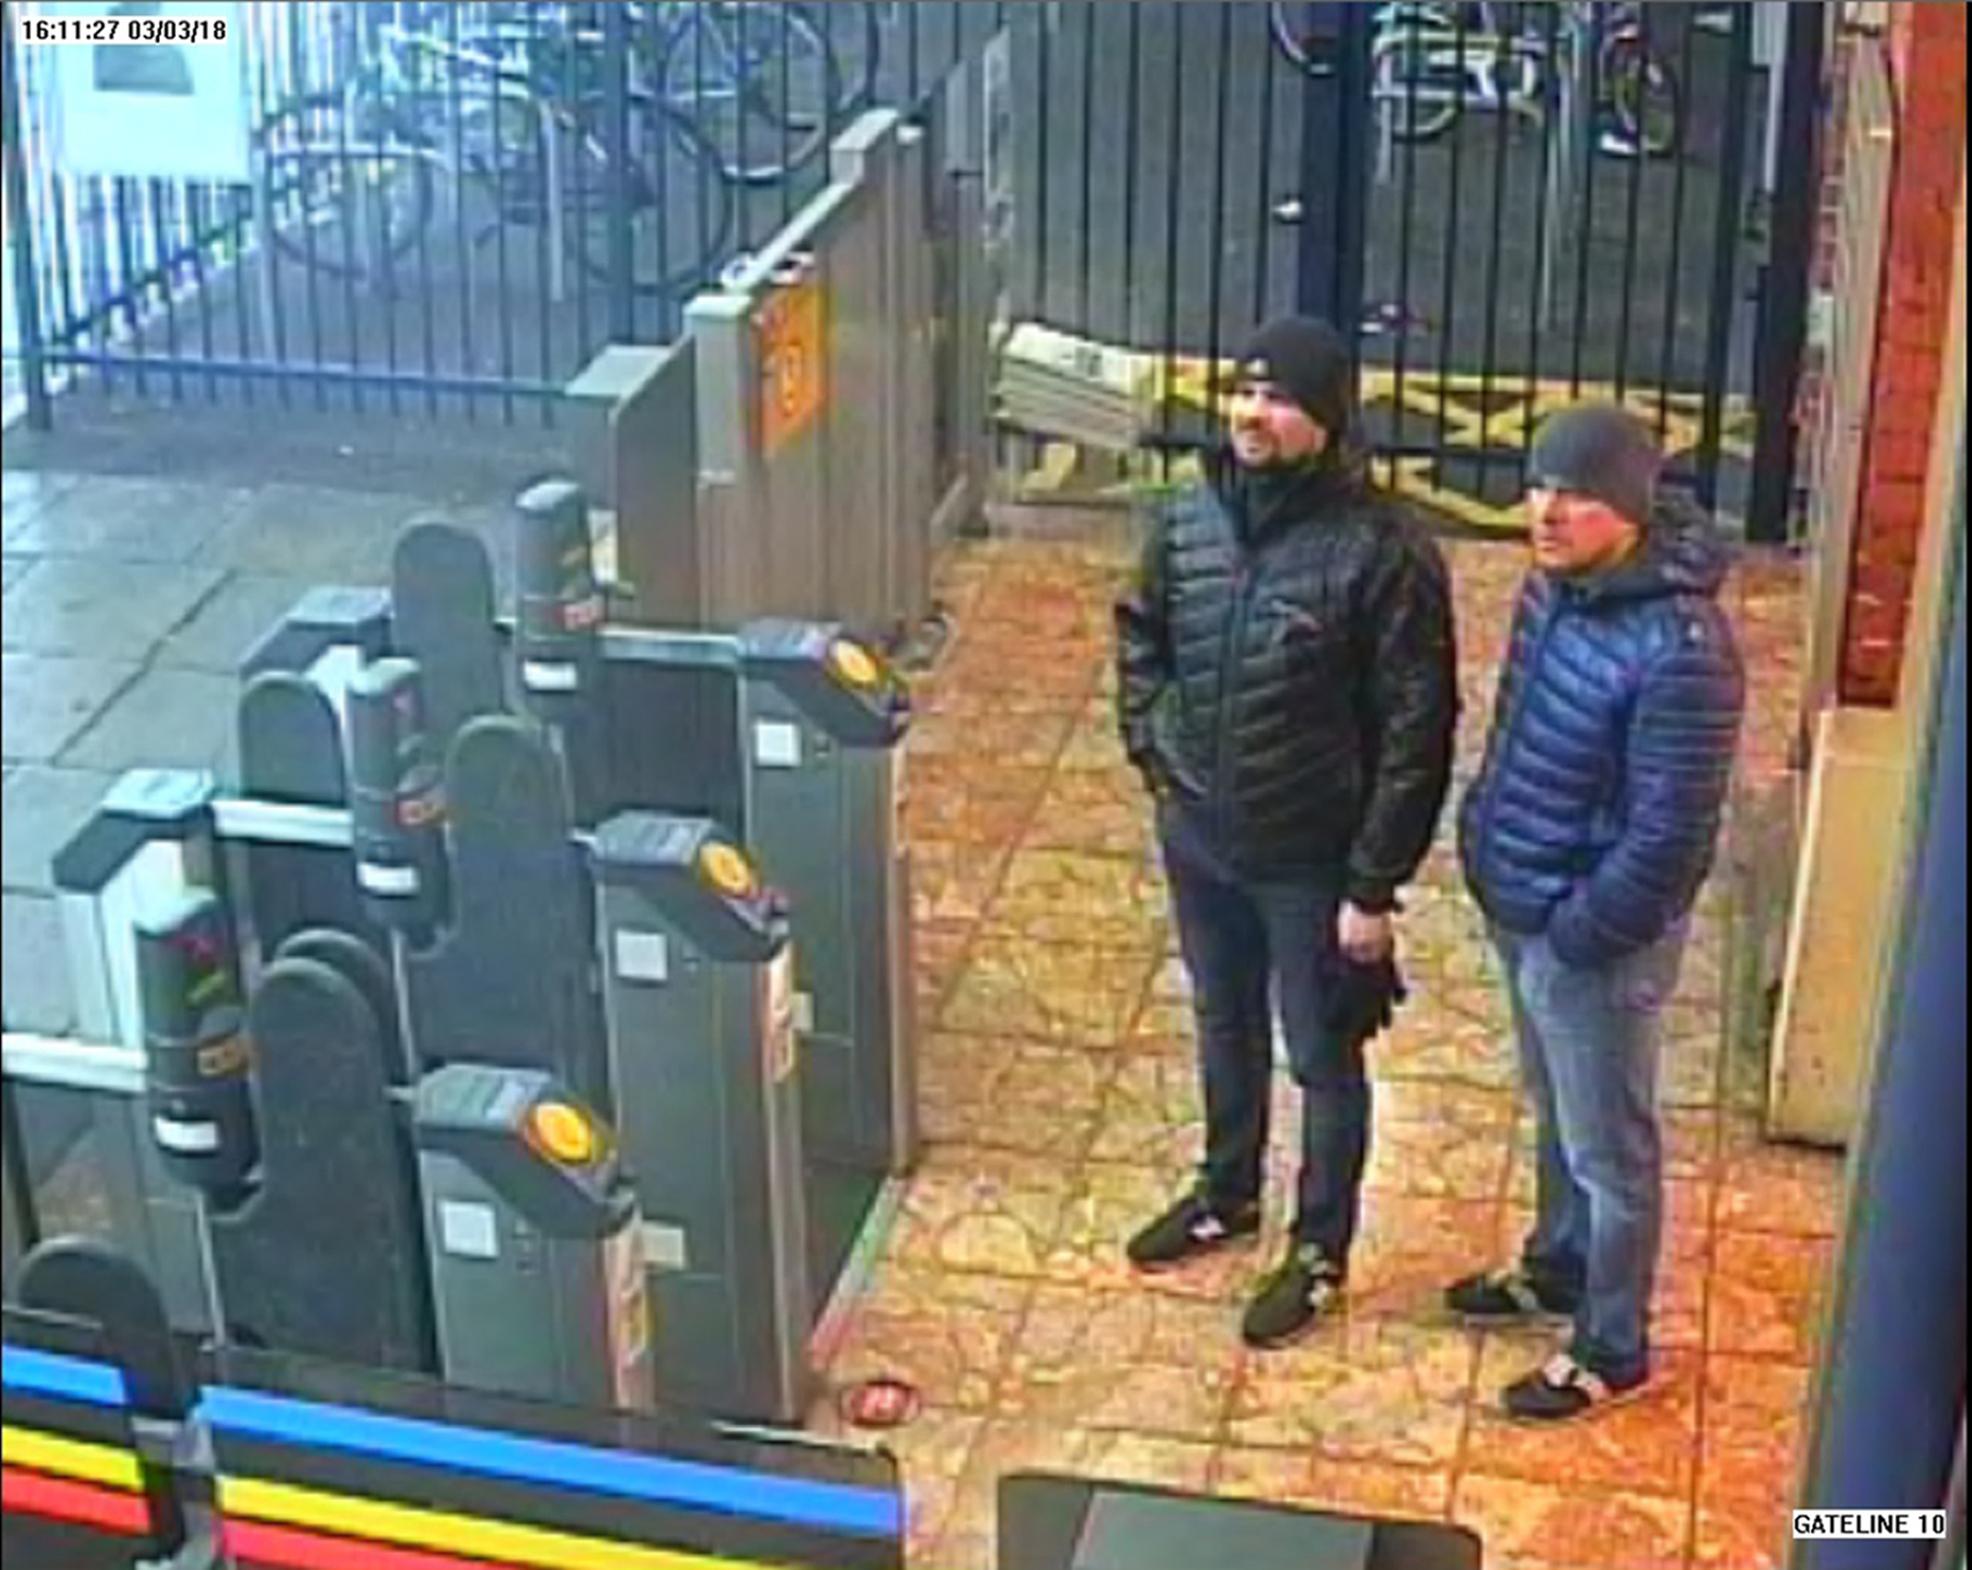 Ruslan Boshirov and Alexander Petrov